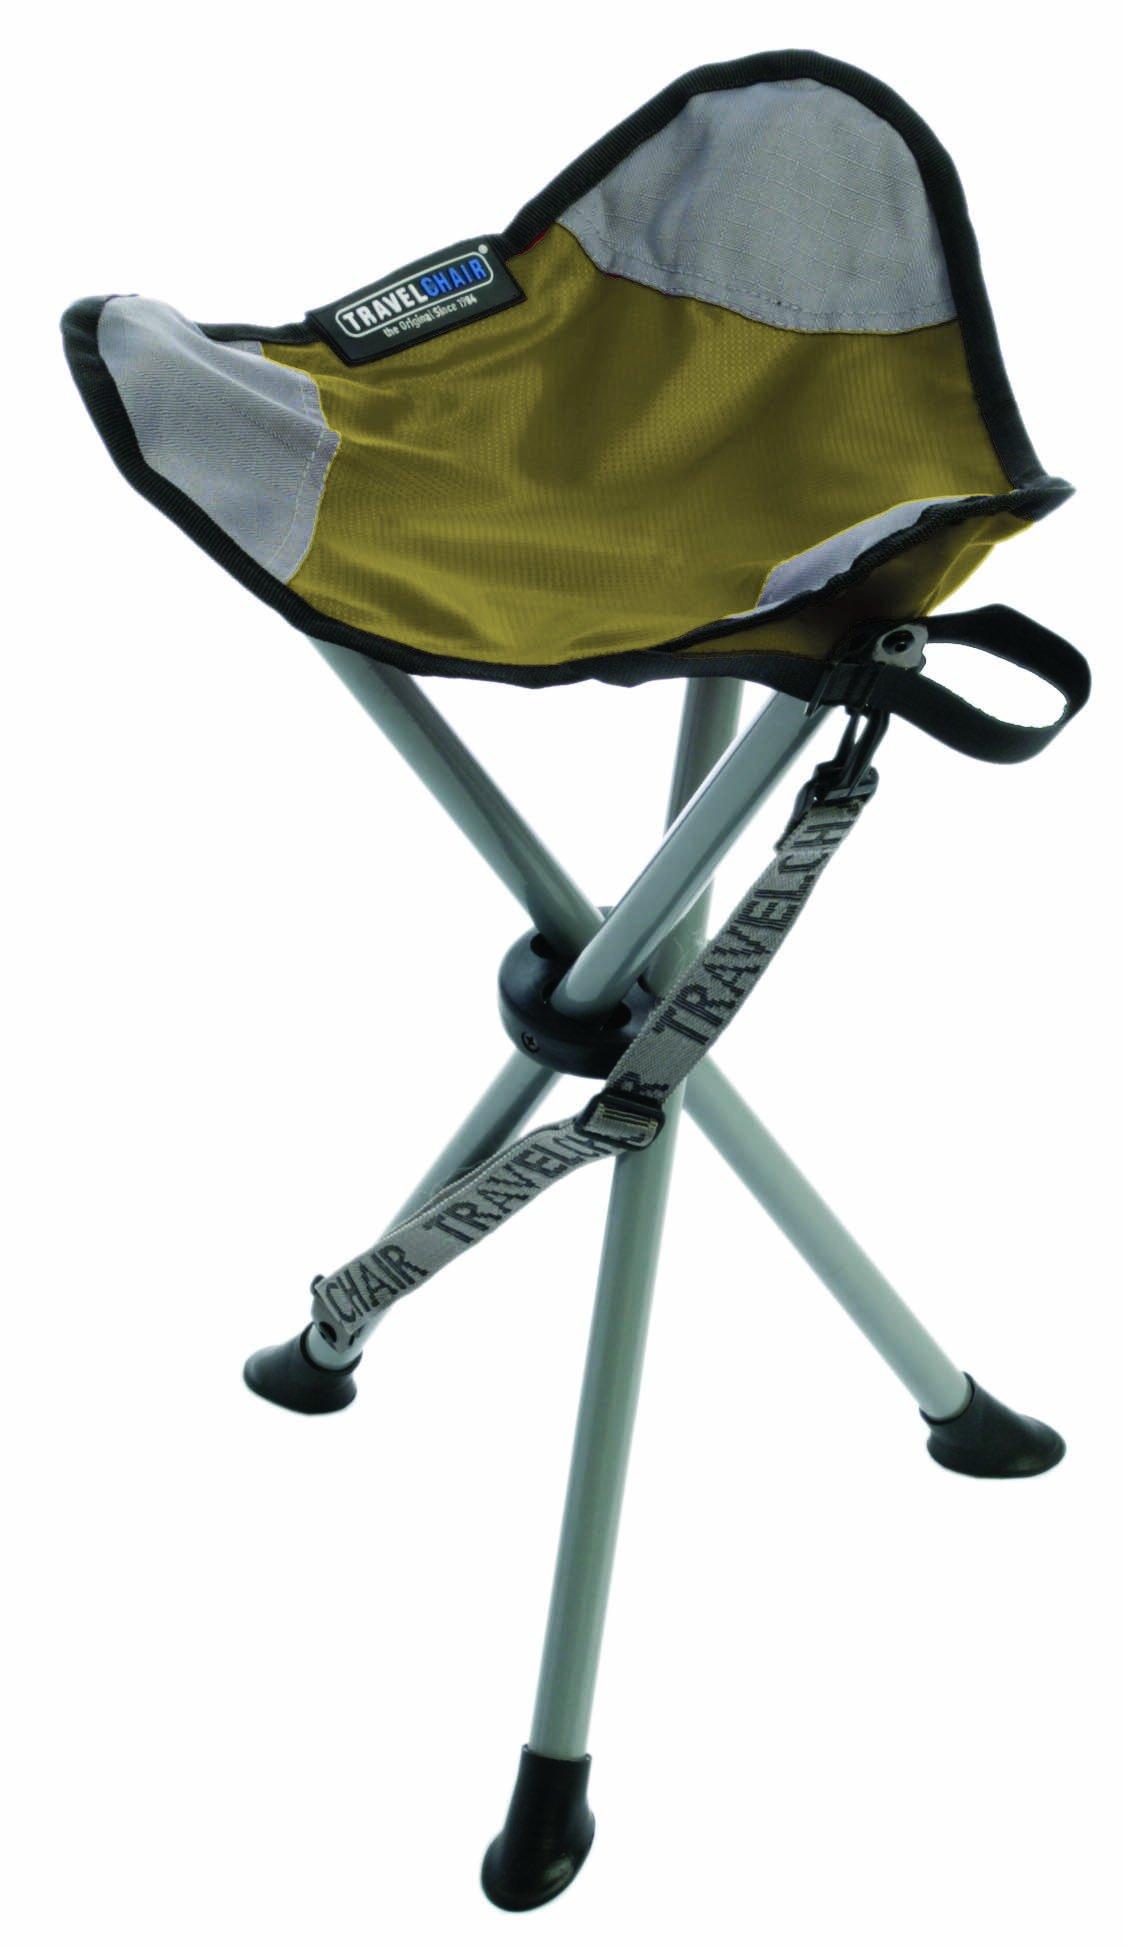 TravelChair Slacker Chair, Tripod Stool, Green by TravelChair